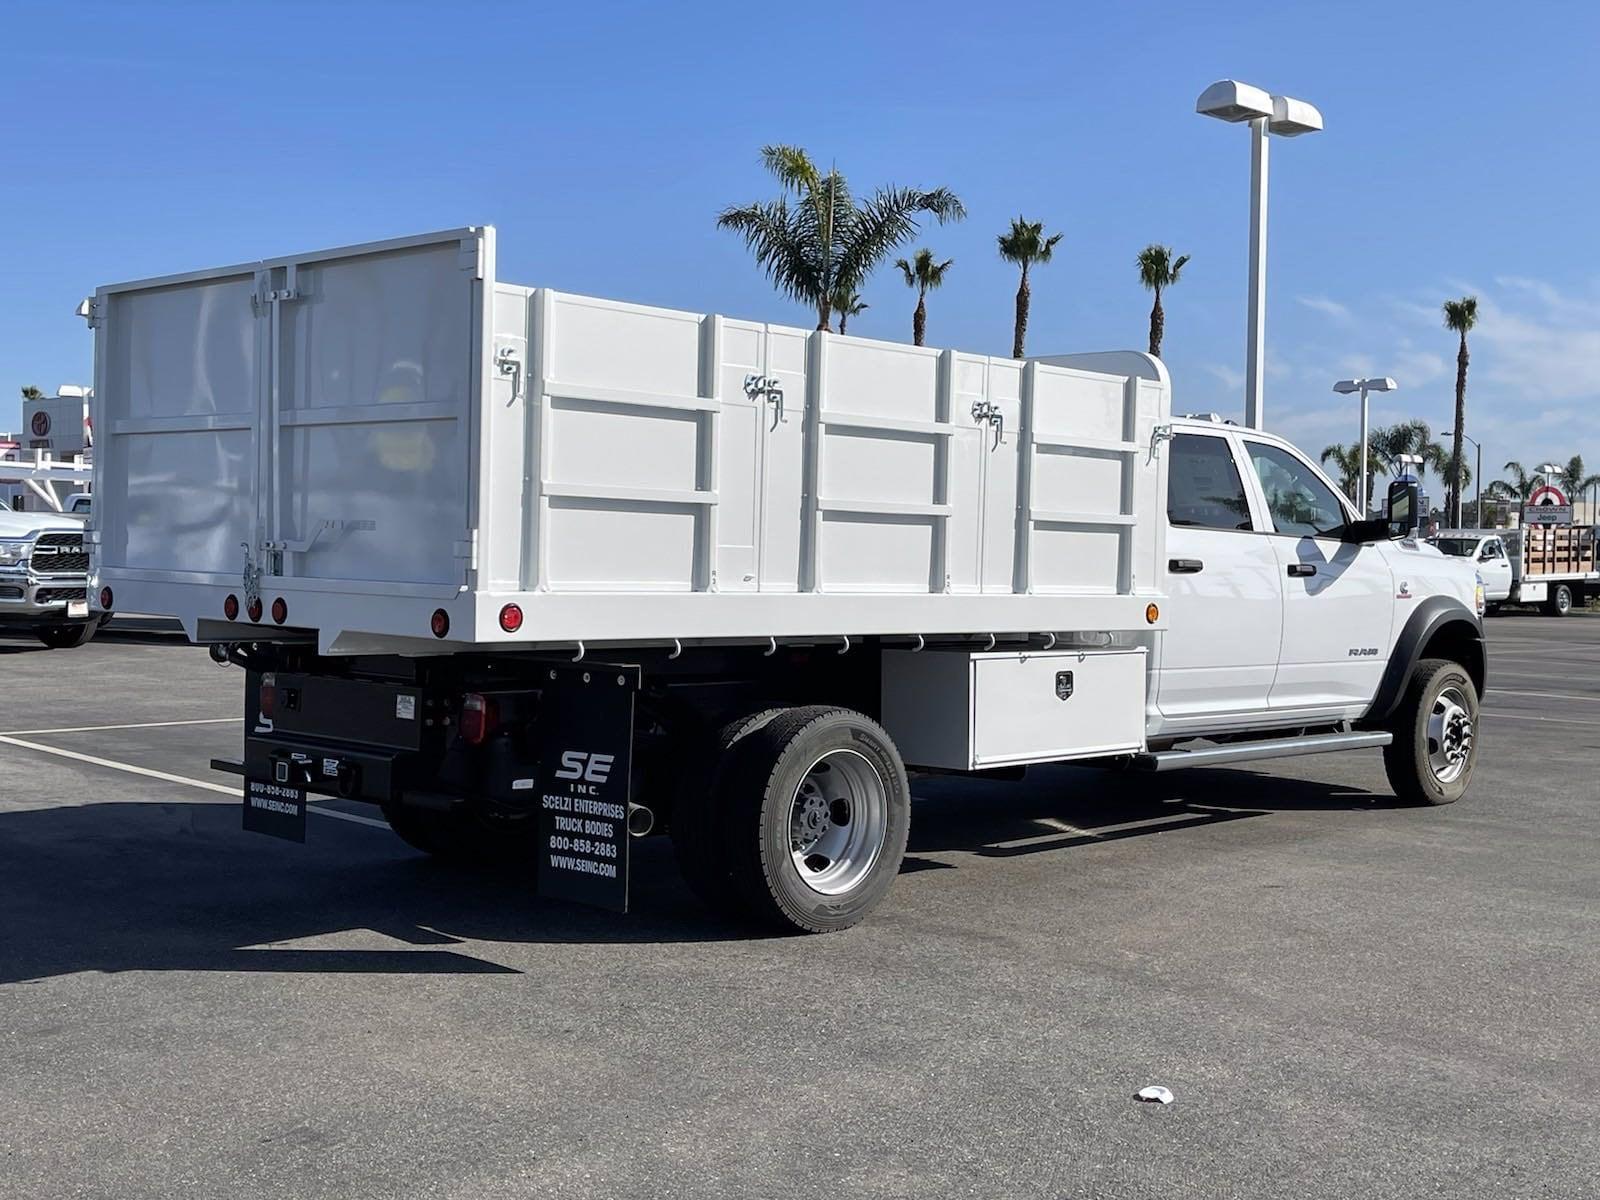 2020 Ram 5500 Crew Cab DRW 4x4, Scelzi Landscape Dump #H2300 - photo 1